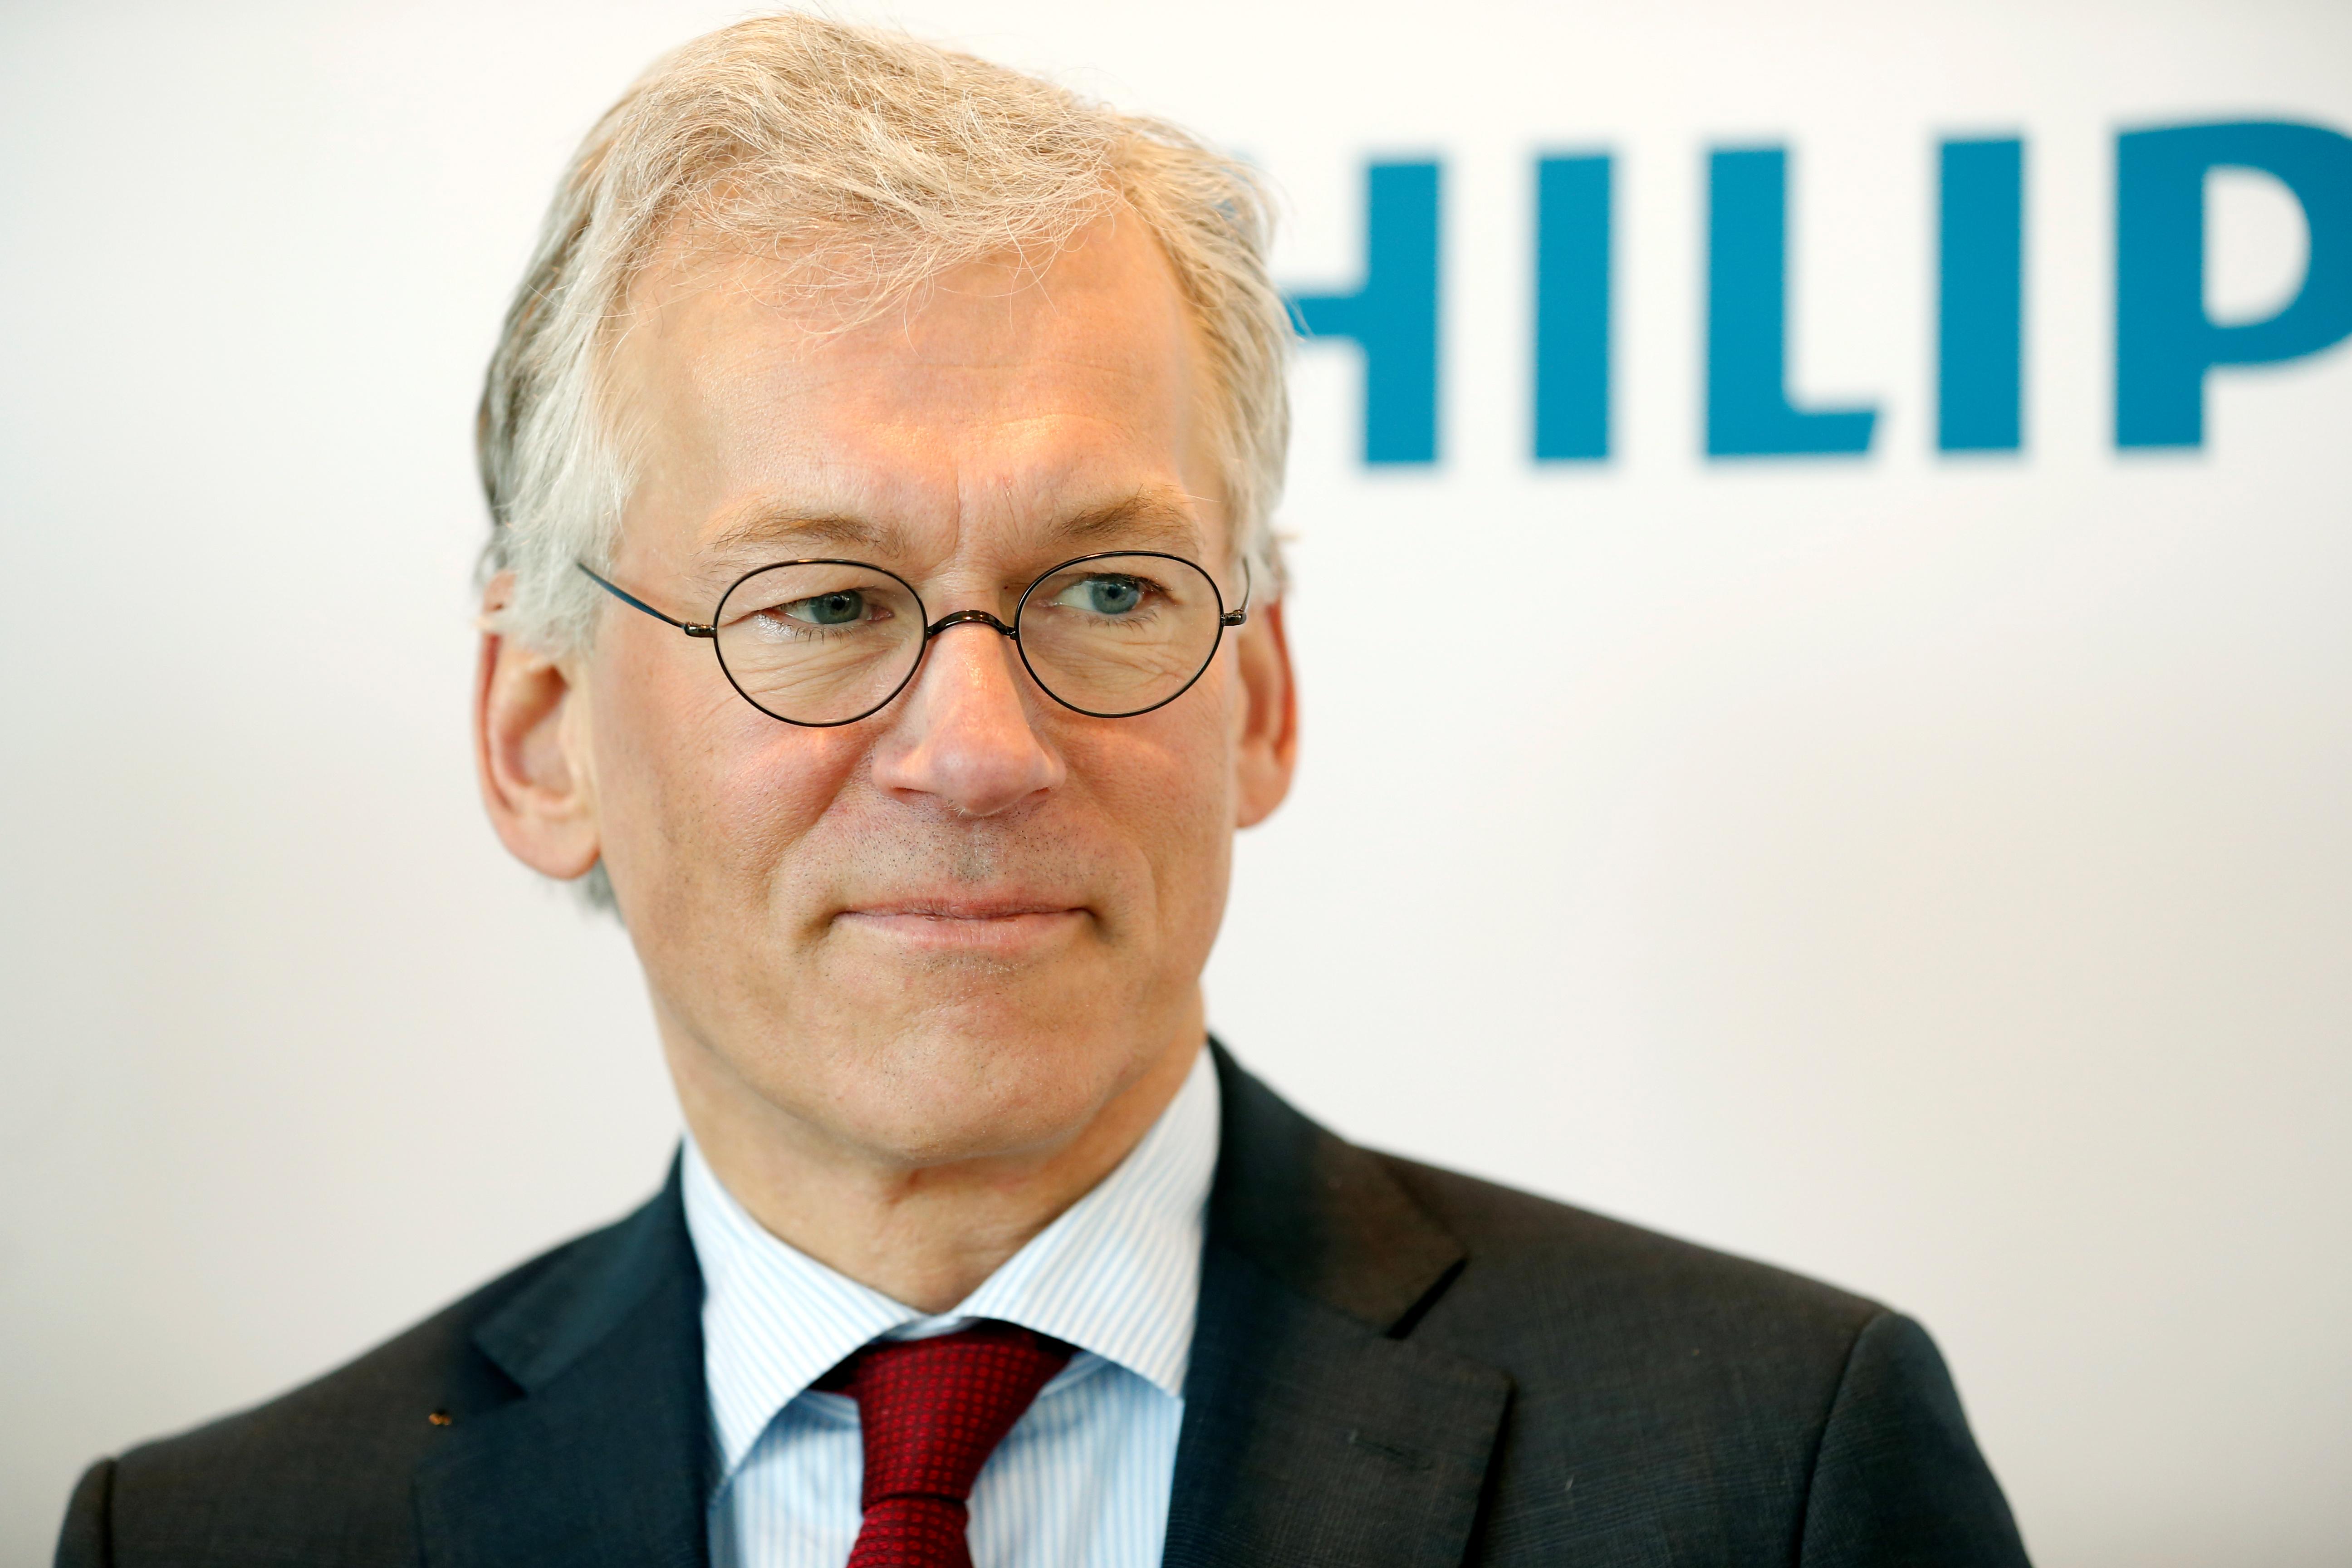 Philips CEO Frans van Houten is pictured in Amsterdam, Netherlands, January 29, 2019. REUTERS/Eva Plevier